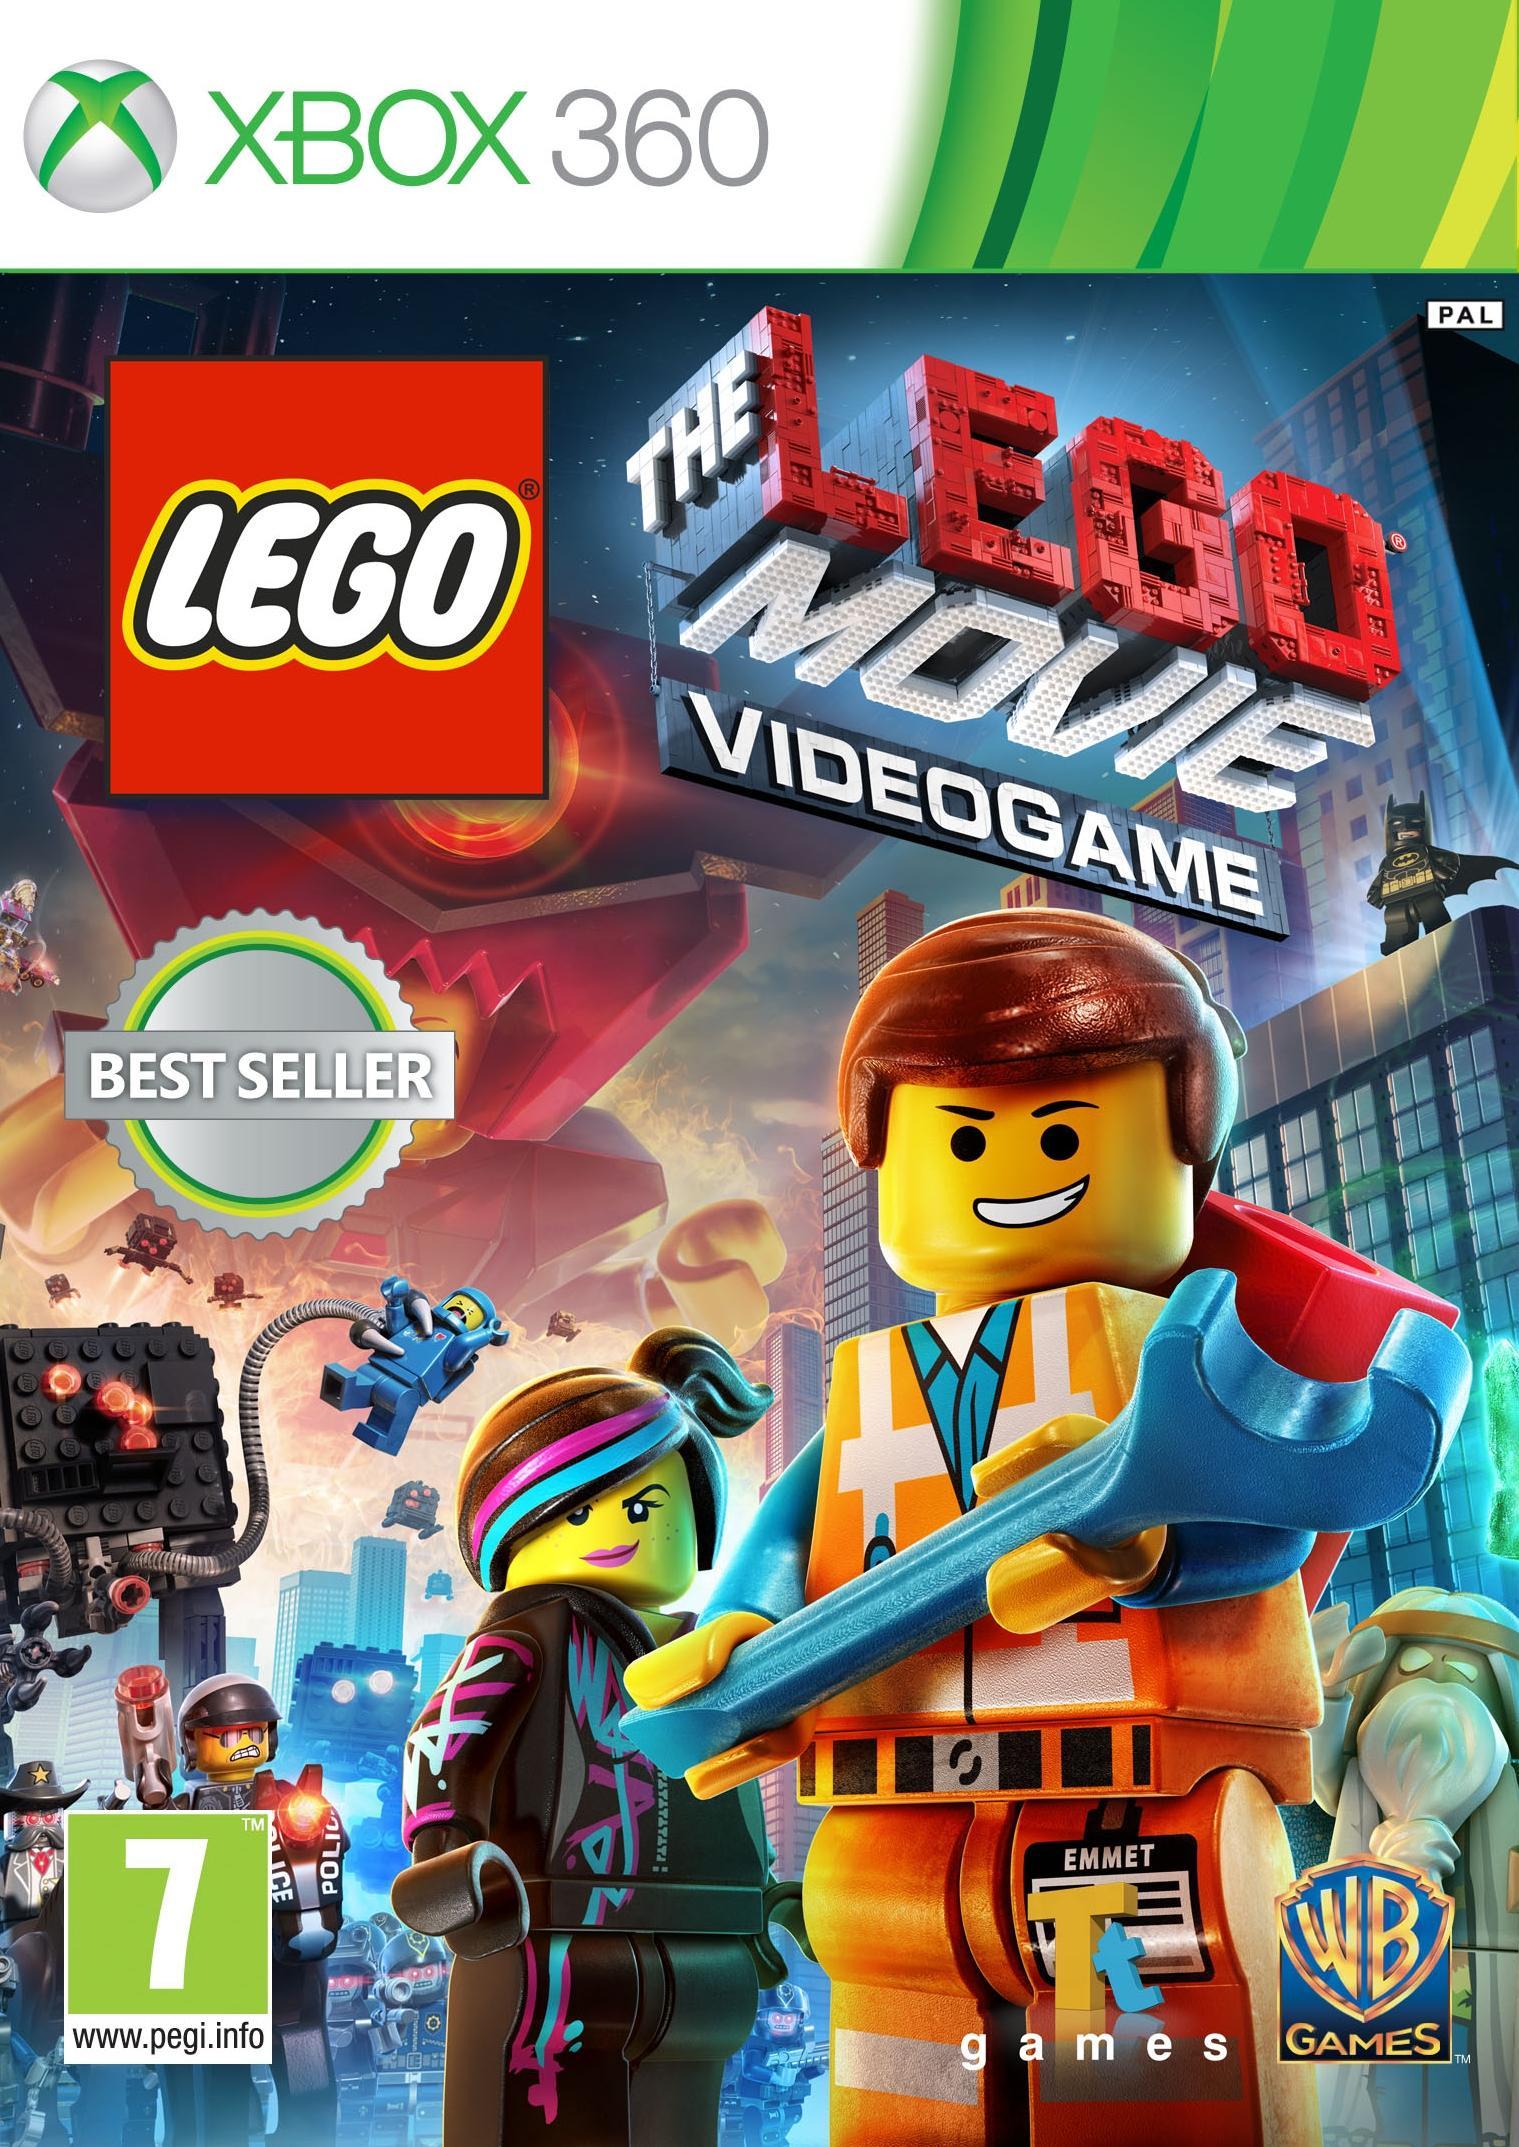 Mindscape LEGO Movie (Classics) Xbox 360 (1000569307) thumbnail